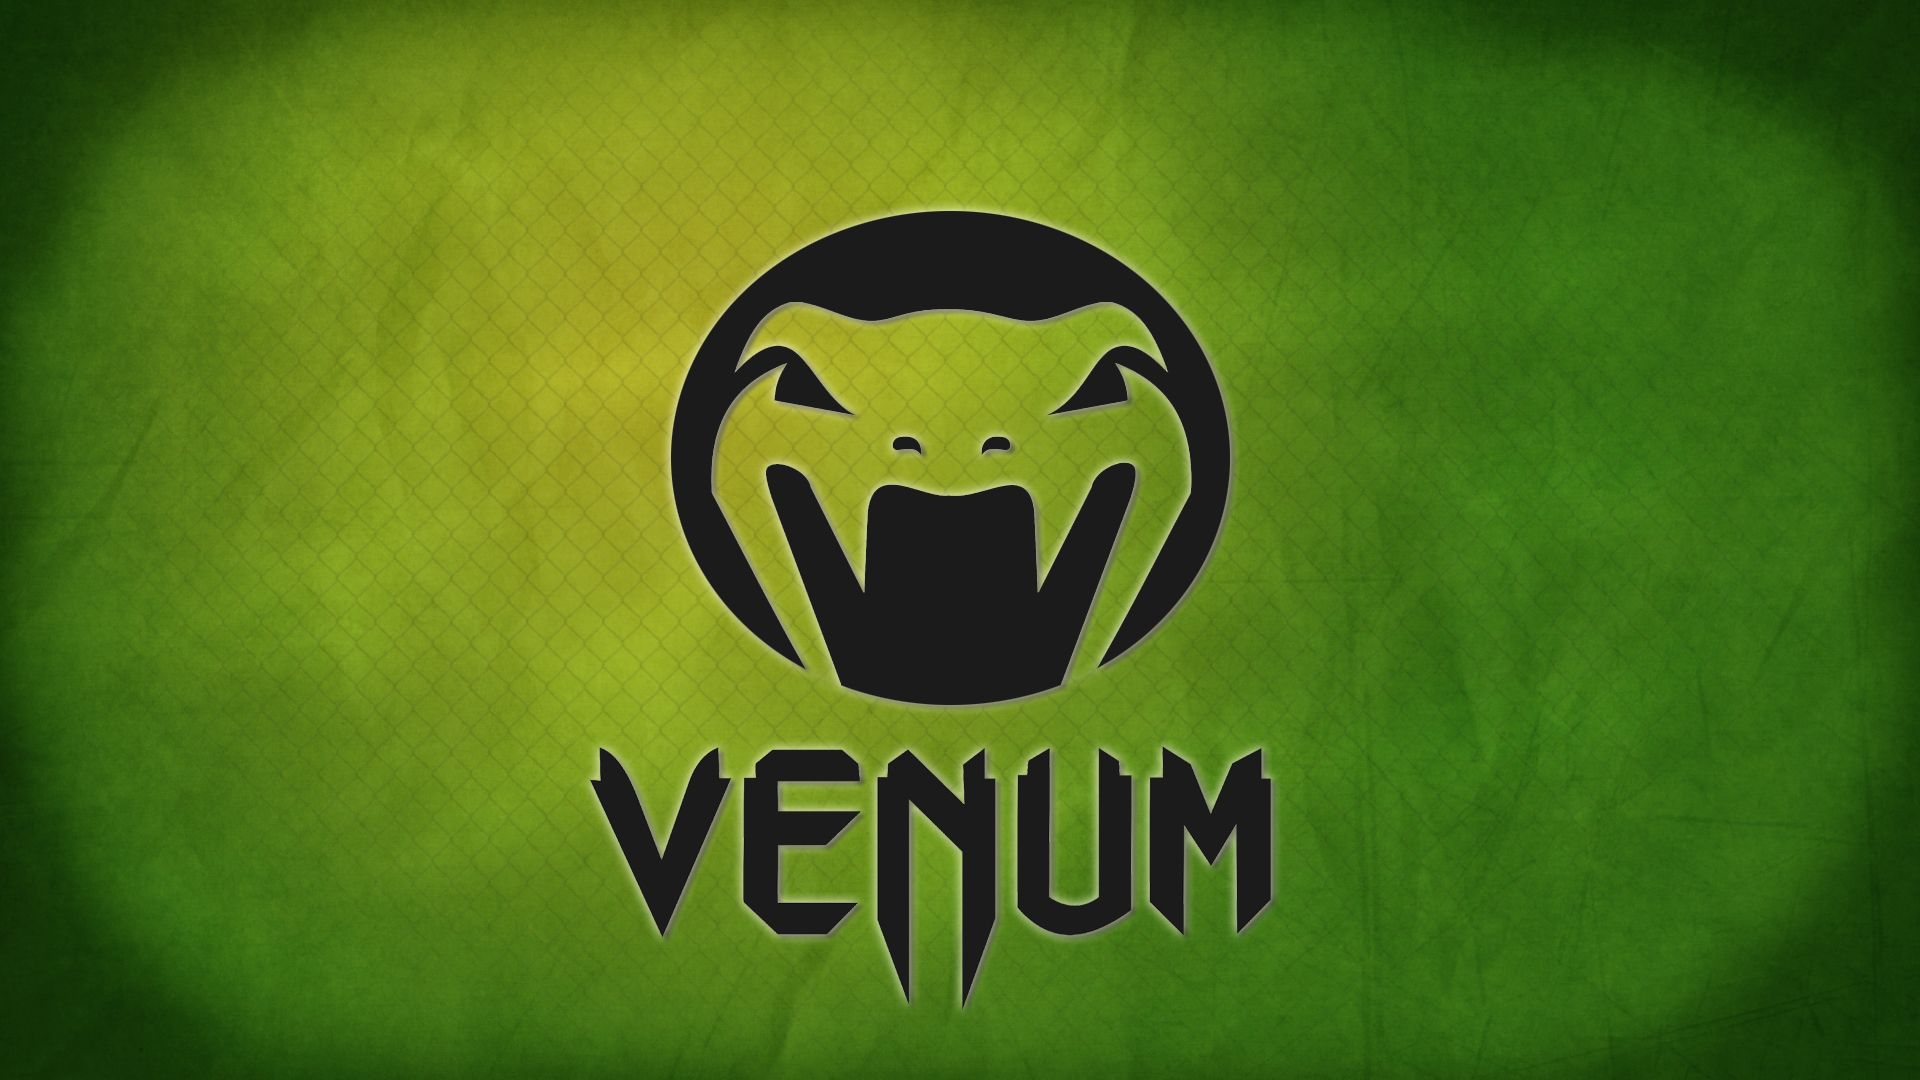 ekipirovka ufc mma logo fights venum 2012 mma